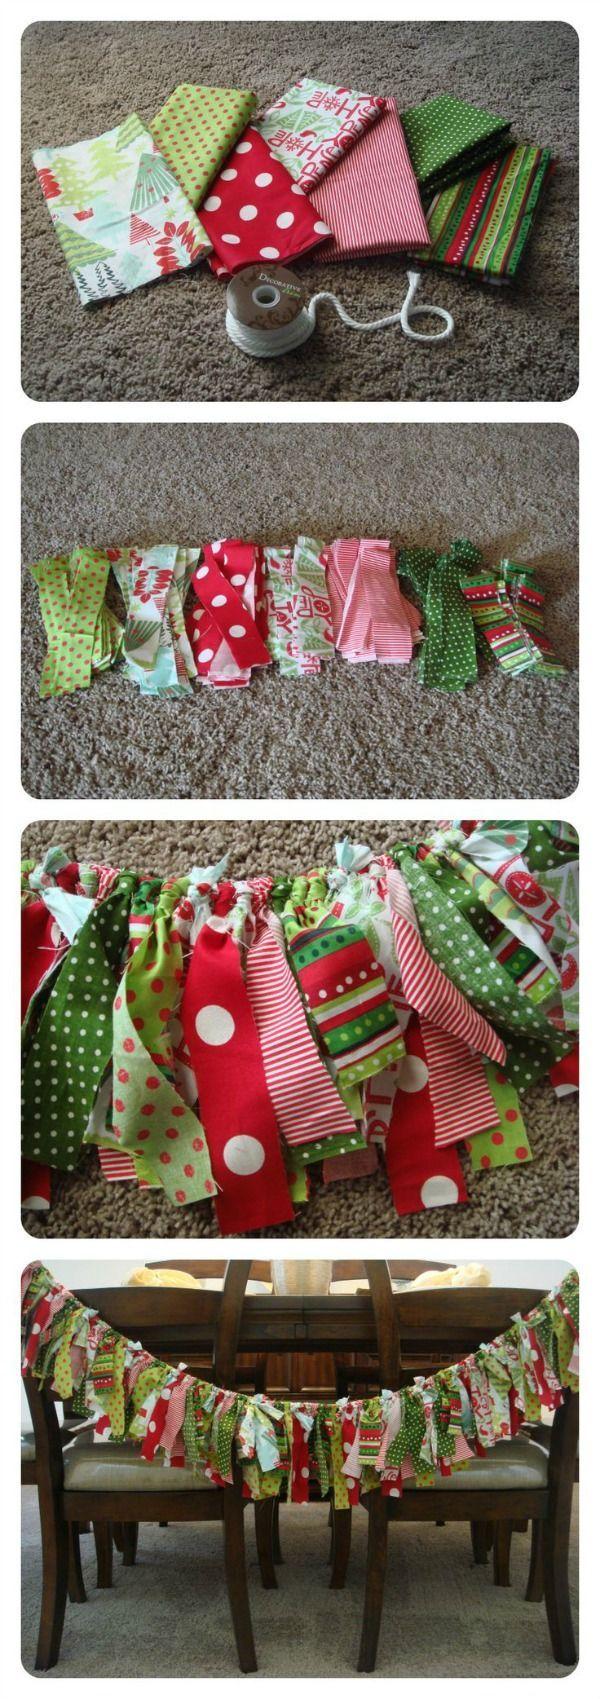 DIY Fabric Garland | Christmas Art | Pinterest | Fabric ...